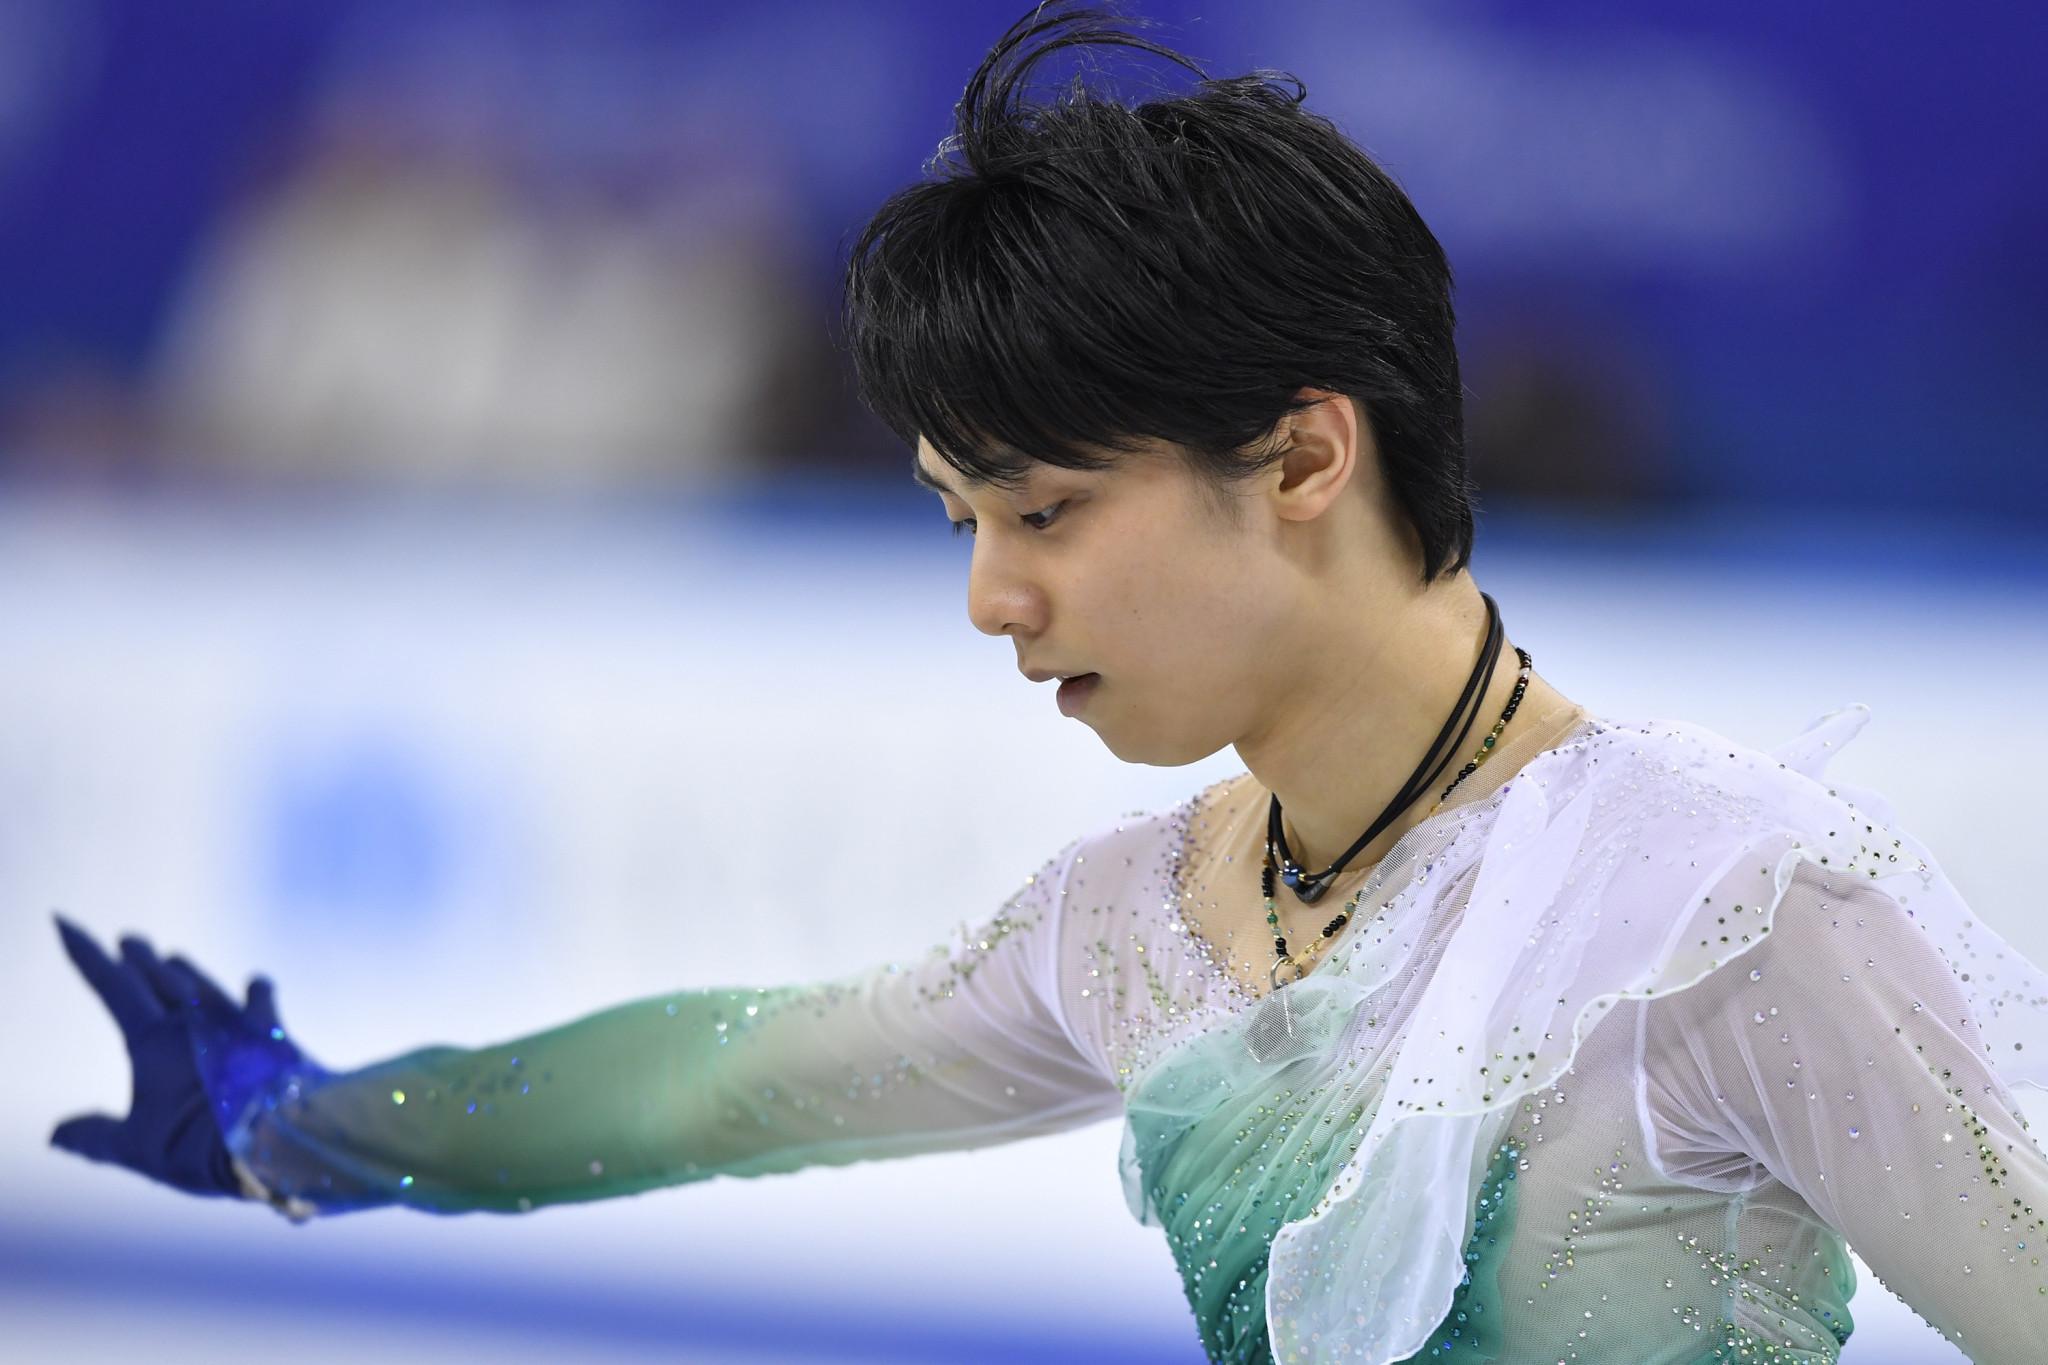 ISU Skating Awards deemed a success after high broadcast numbers